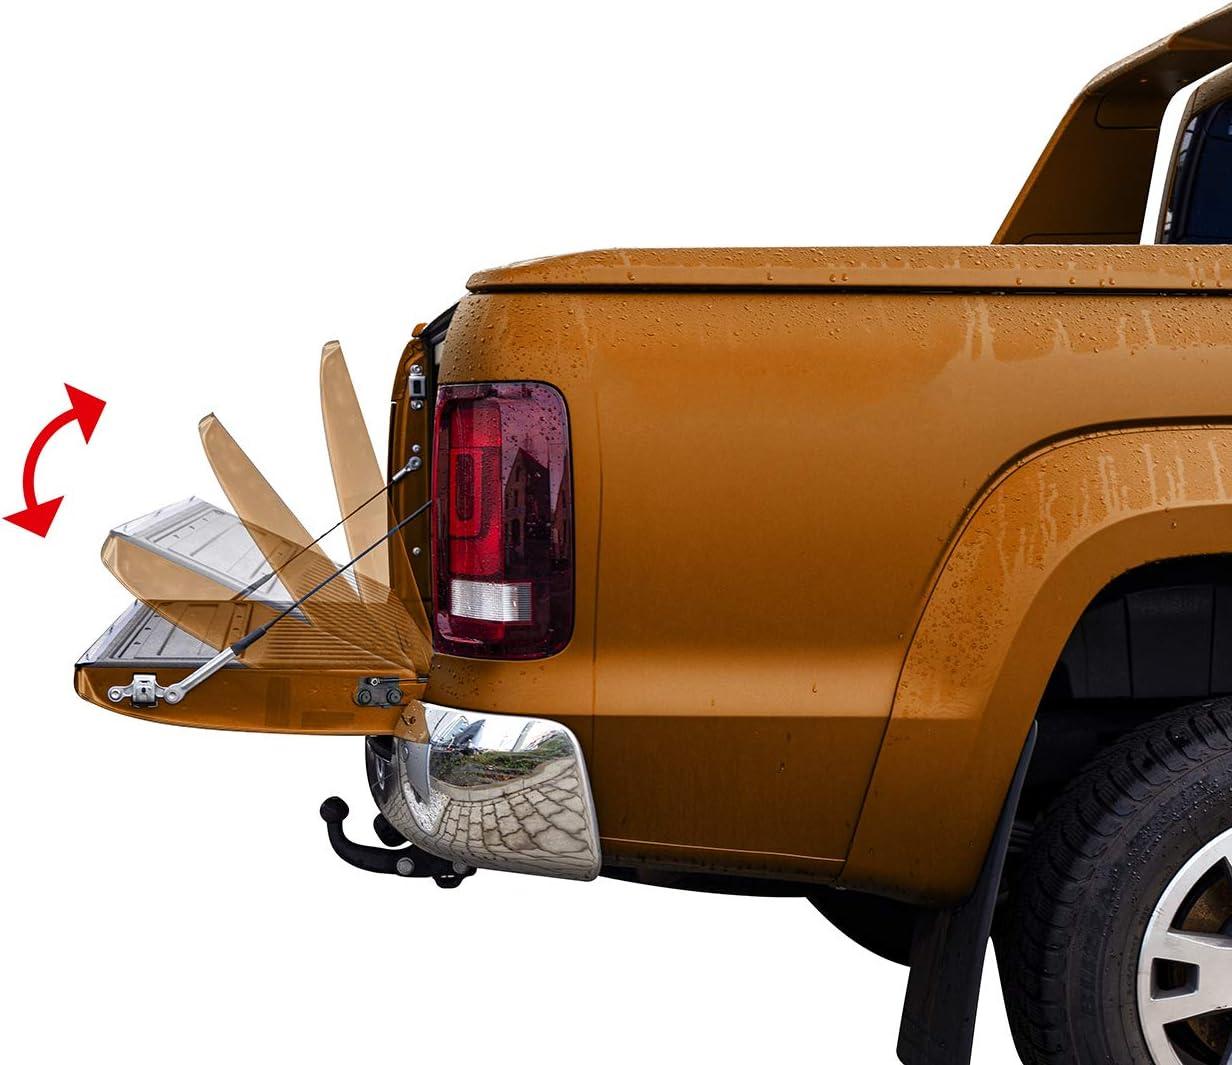 Heckklappend/ämpfer Nissan Navara NP 300 ab Baujahr 2015 Gasdruckfedern Gasdruckd/ämpfer Gasfeder Heckklappe D/ämpfer Gasd/ämpfer